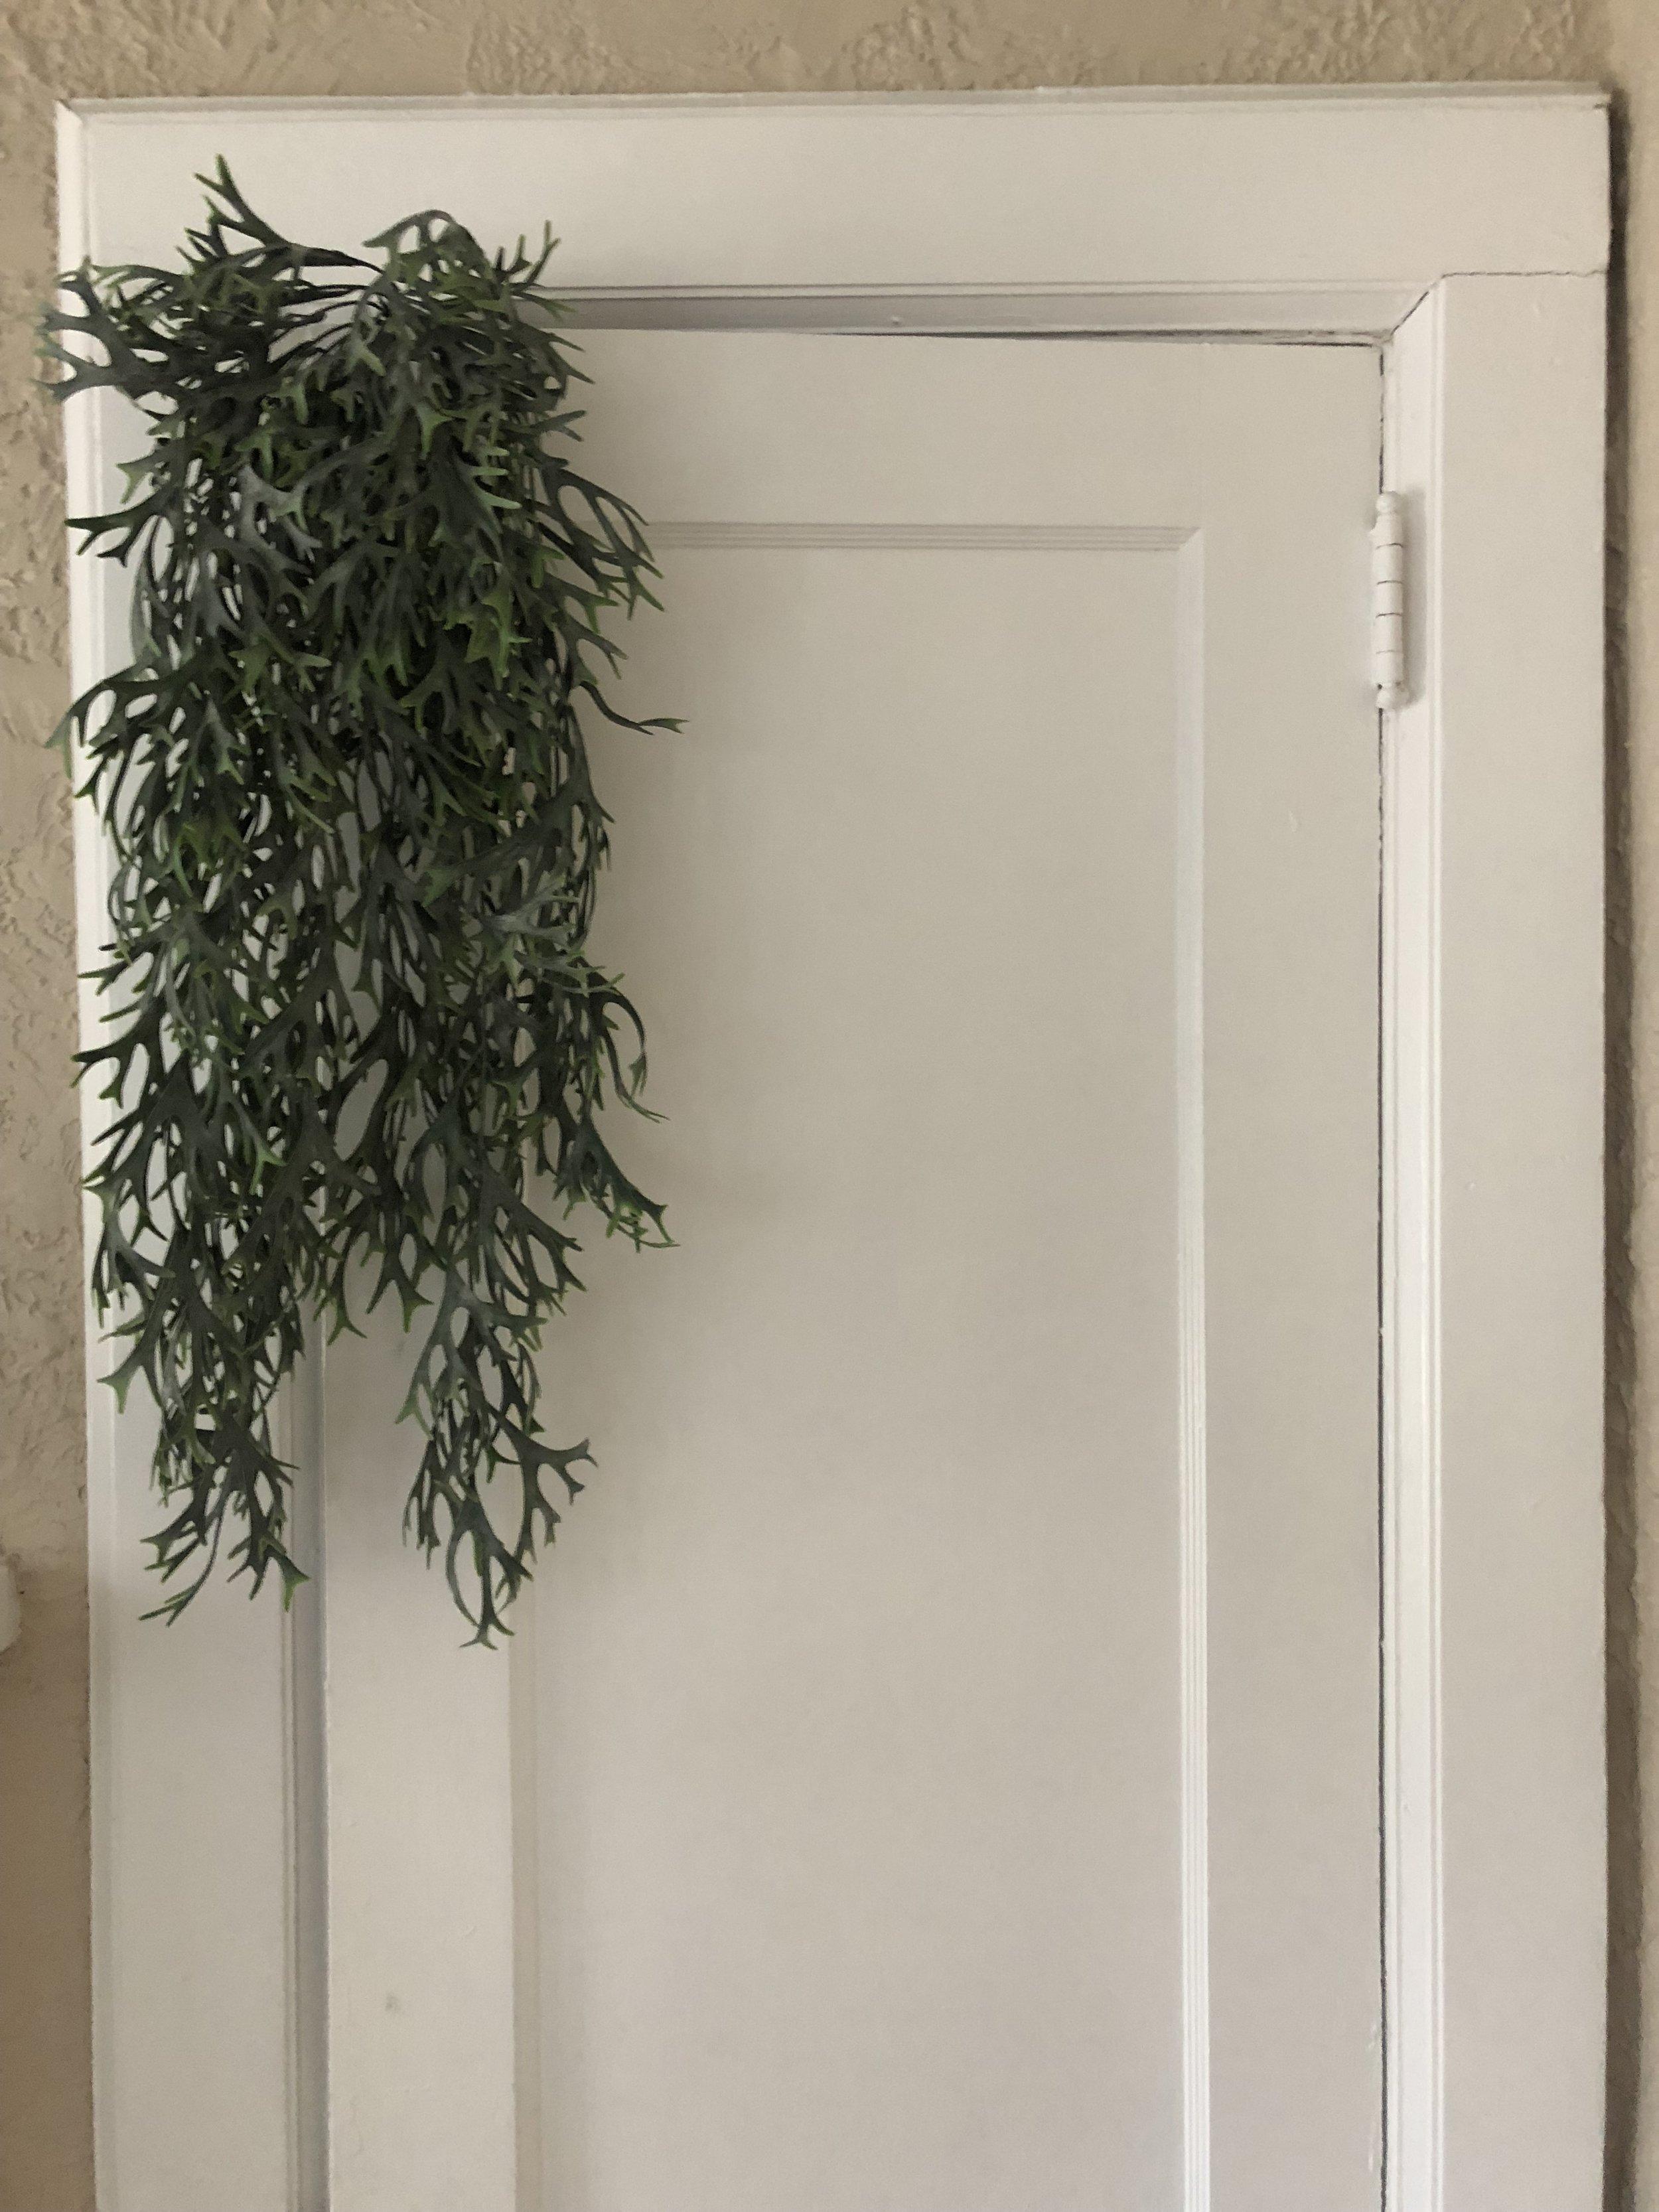 Faux hanging greenery - (Quantity: 5)